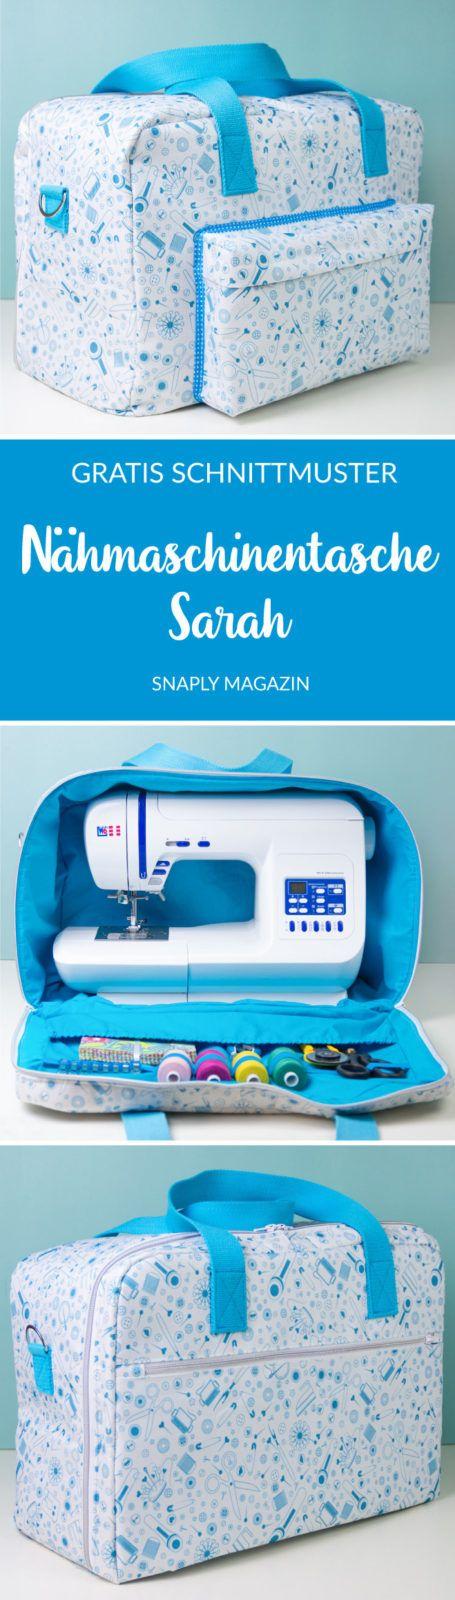 "Gratis Schnittmuster: Nähmaschinentasche ""Sarah"" – Nähen mit Snaply"